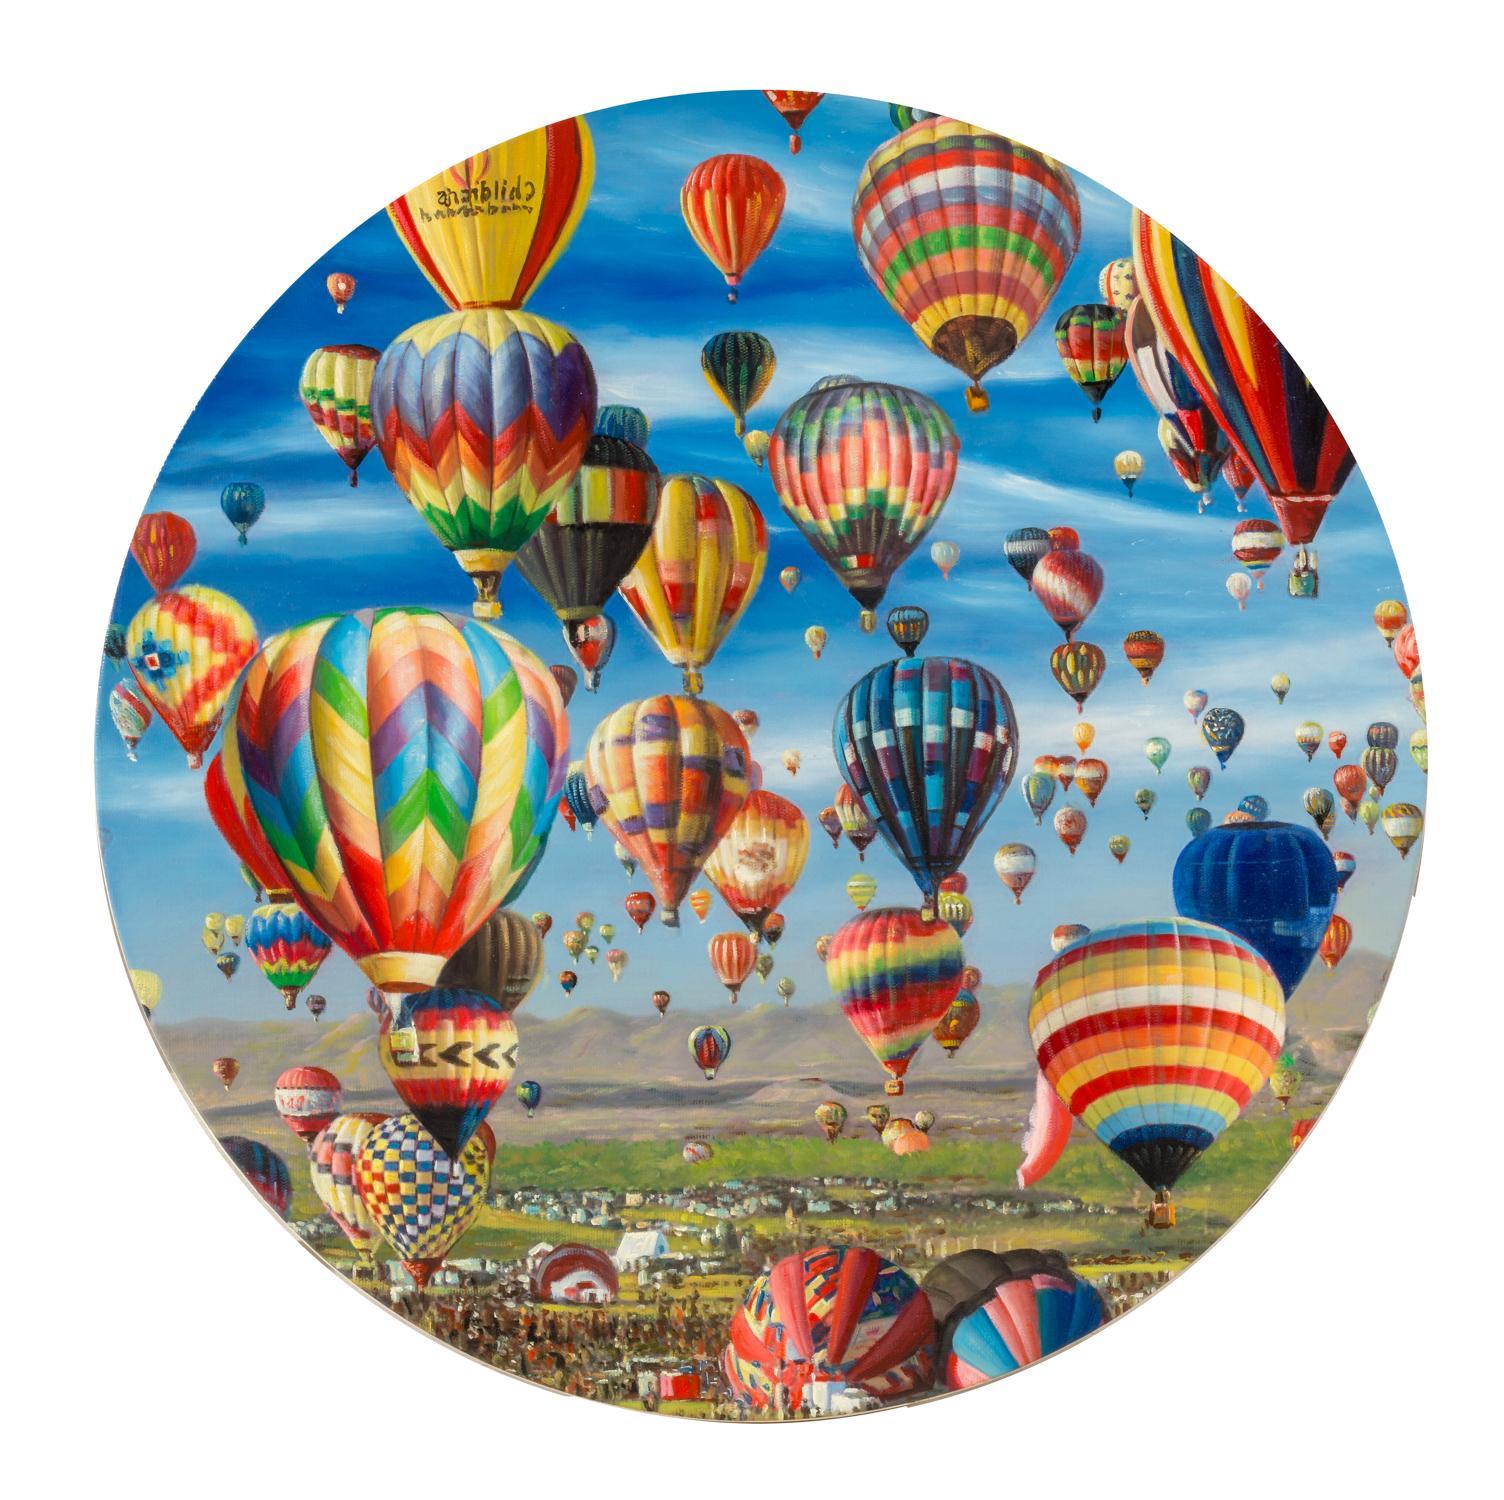 Shay Kun, Balloon air, Oil on canvas, 2017